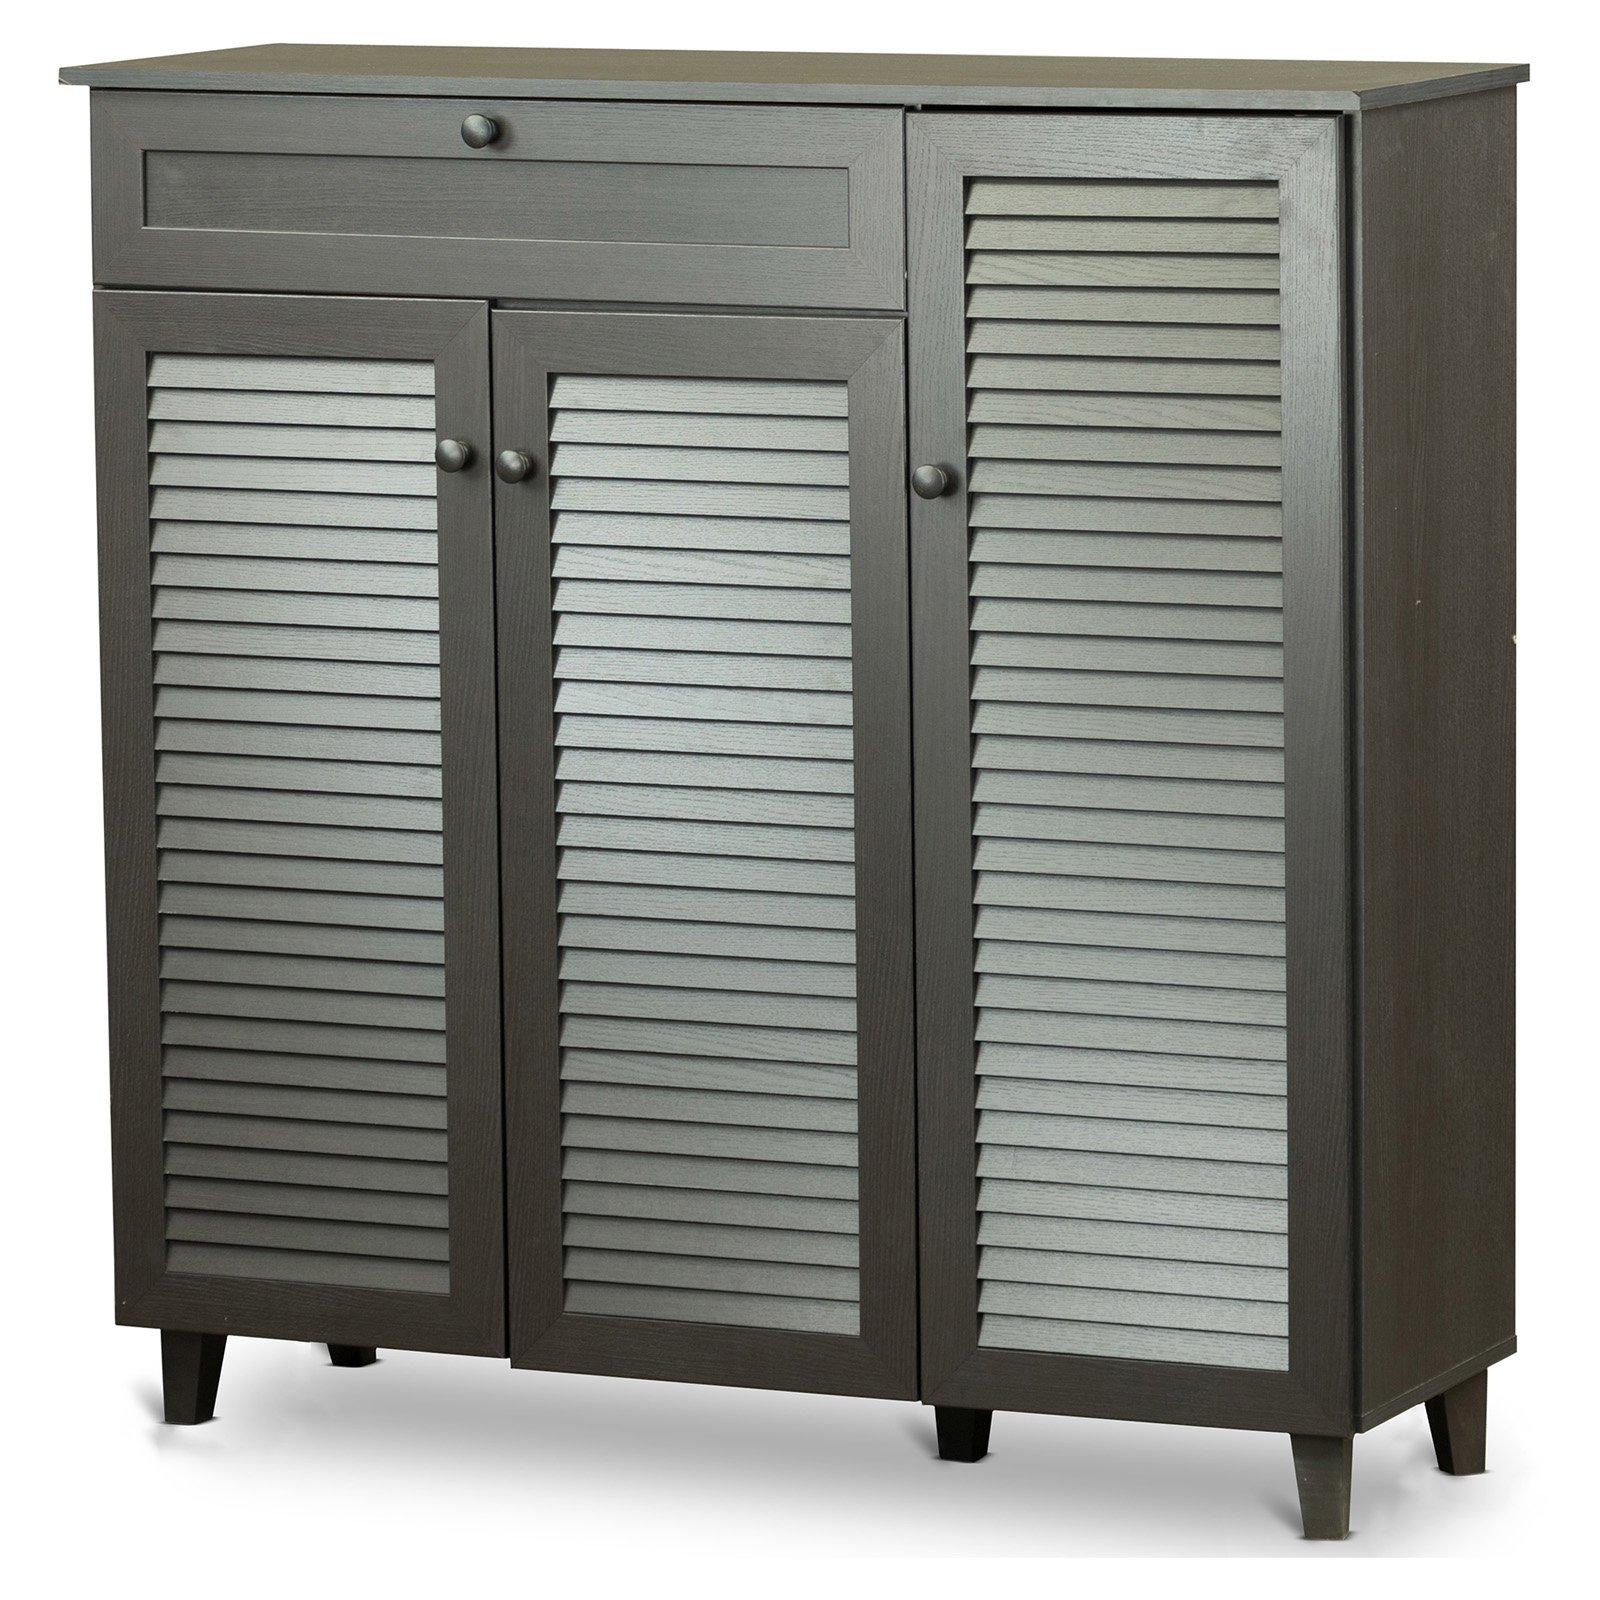 Baxton Studio Pocillo Wood Shoe Storage Cabinet